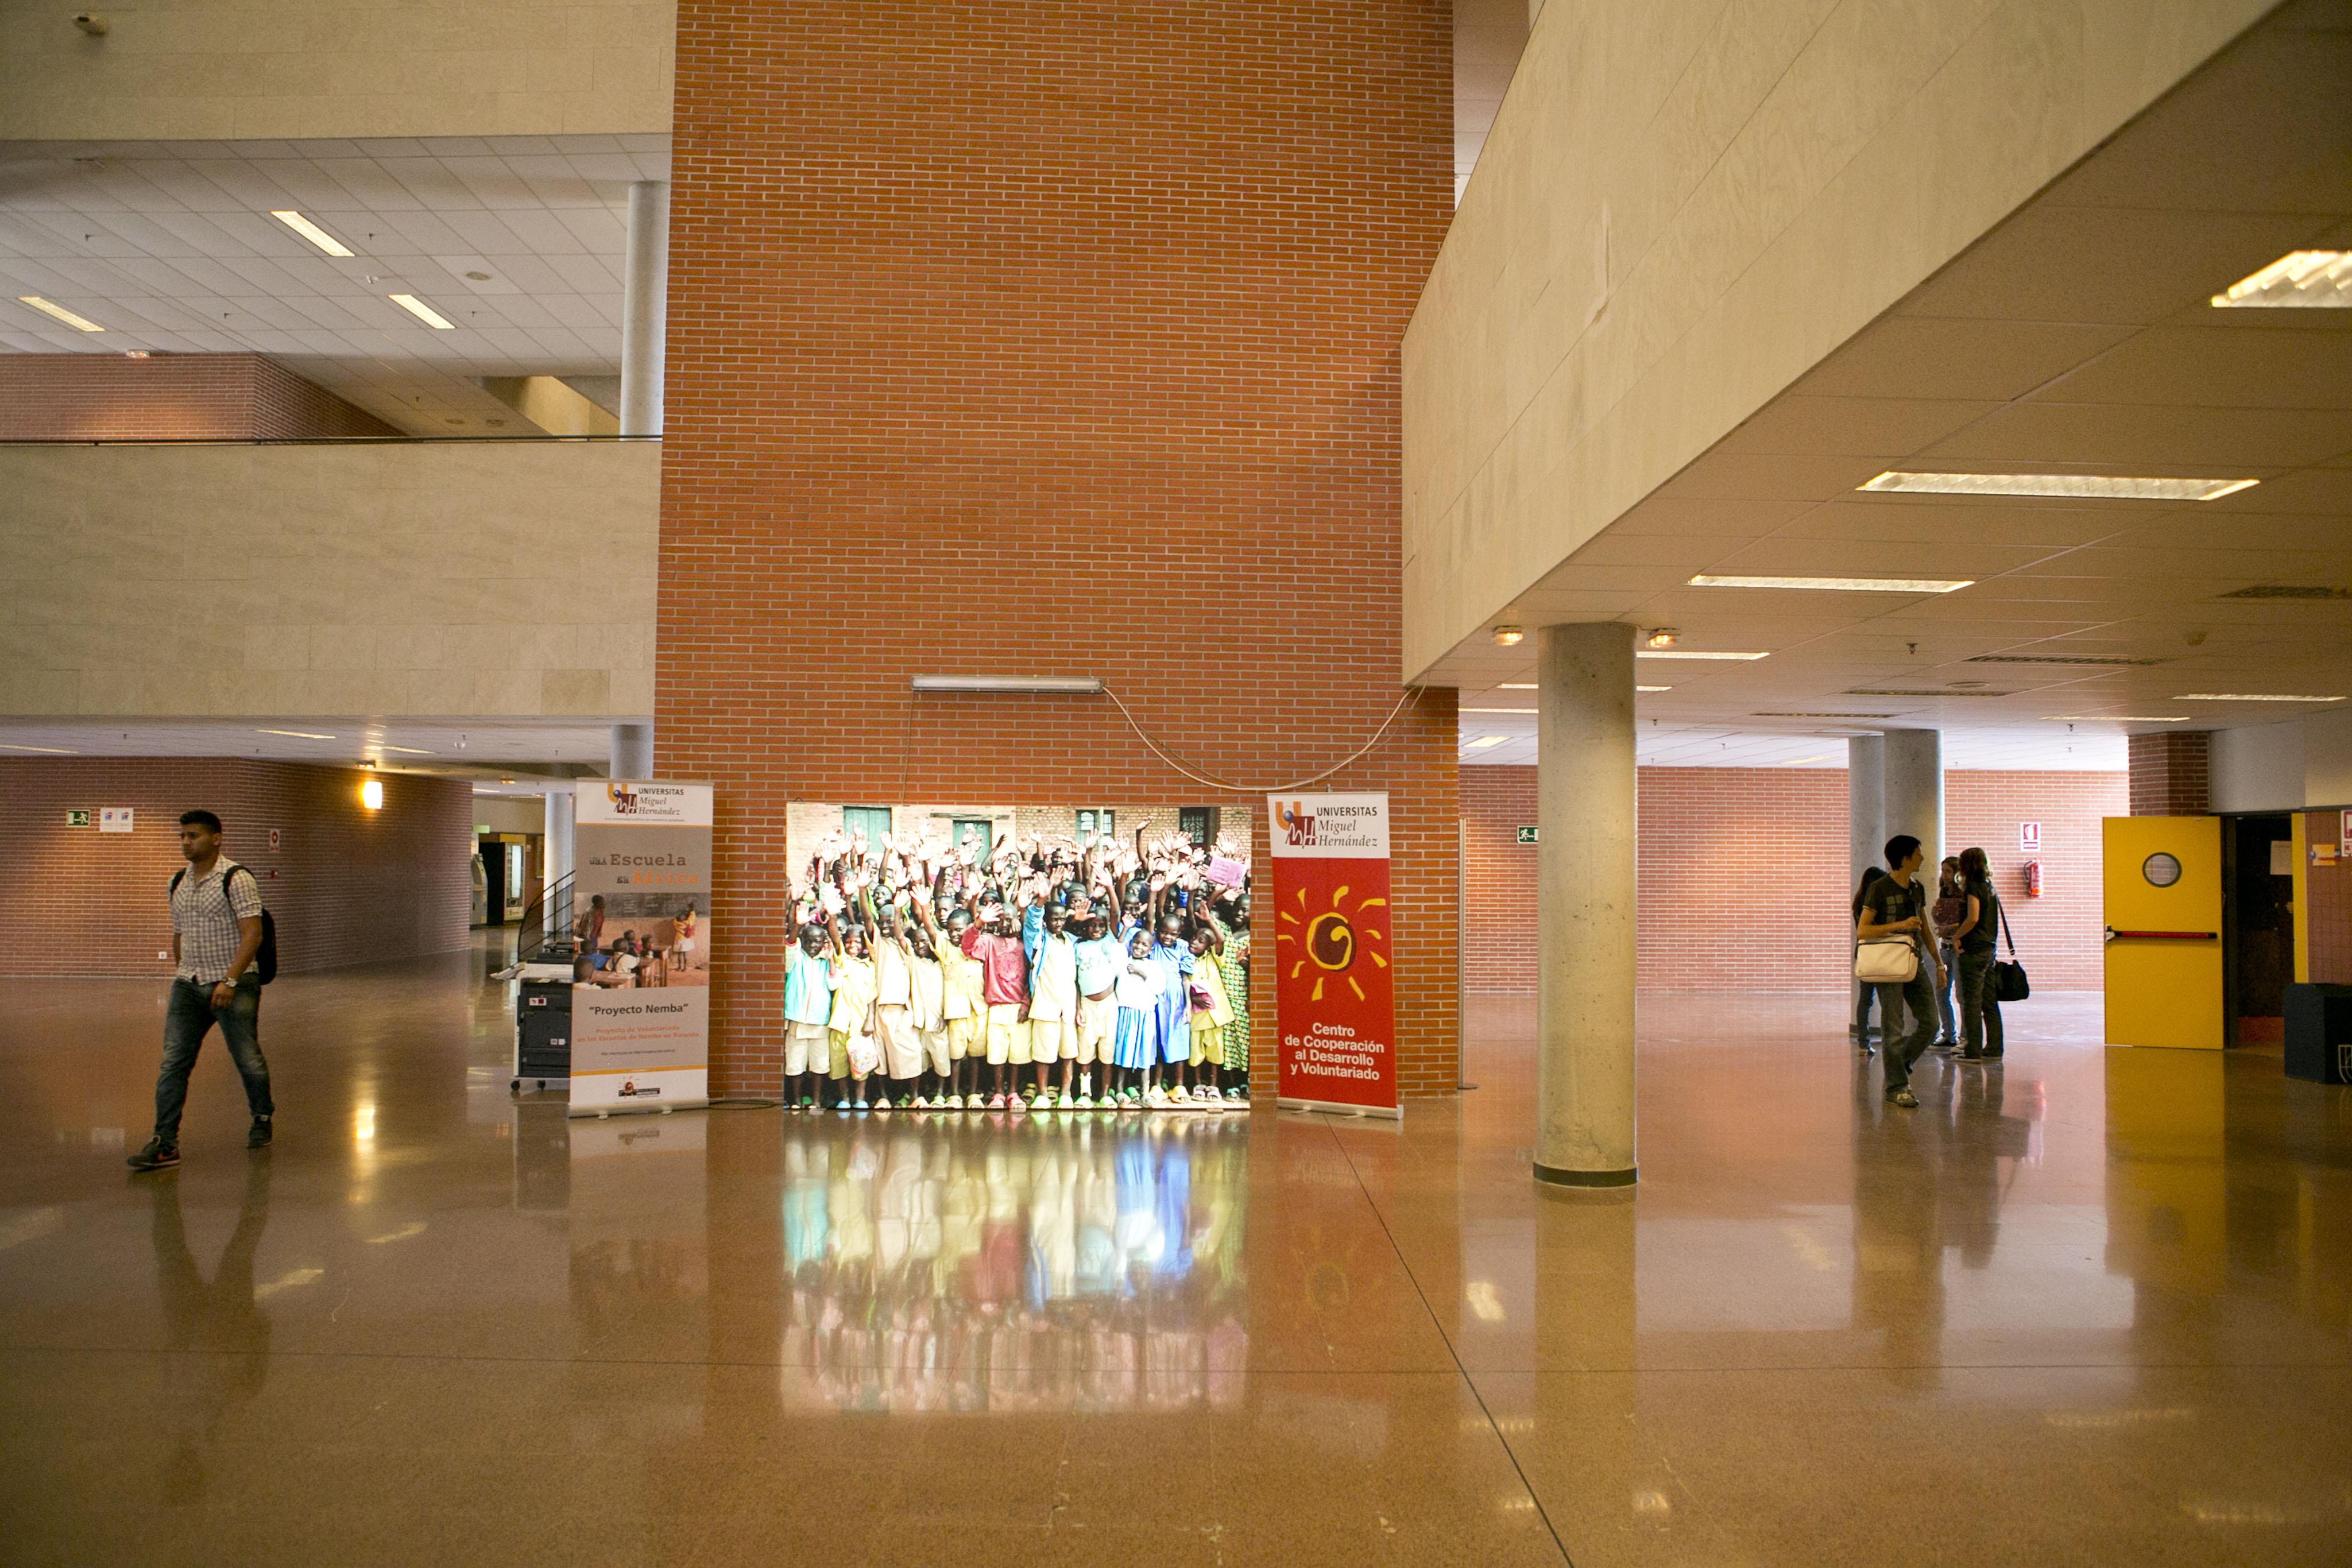 Campus-Elche-exteriores_K8B2592